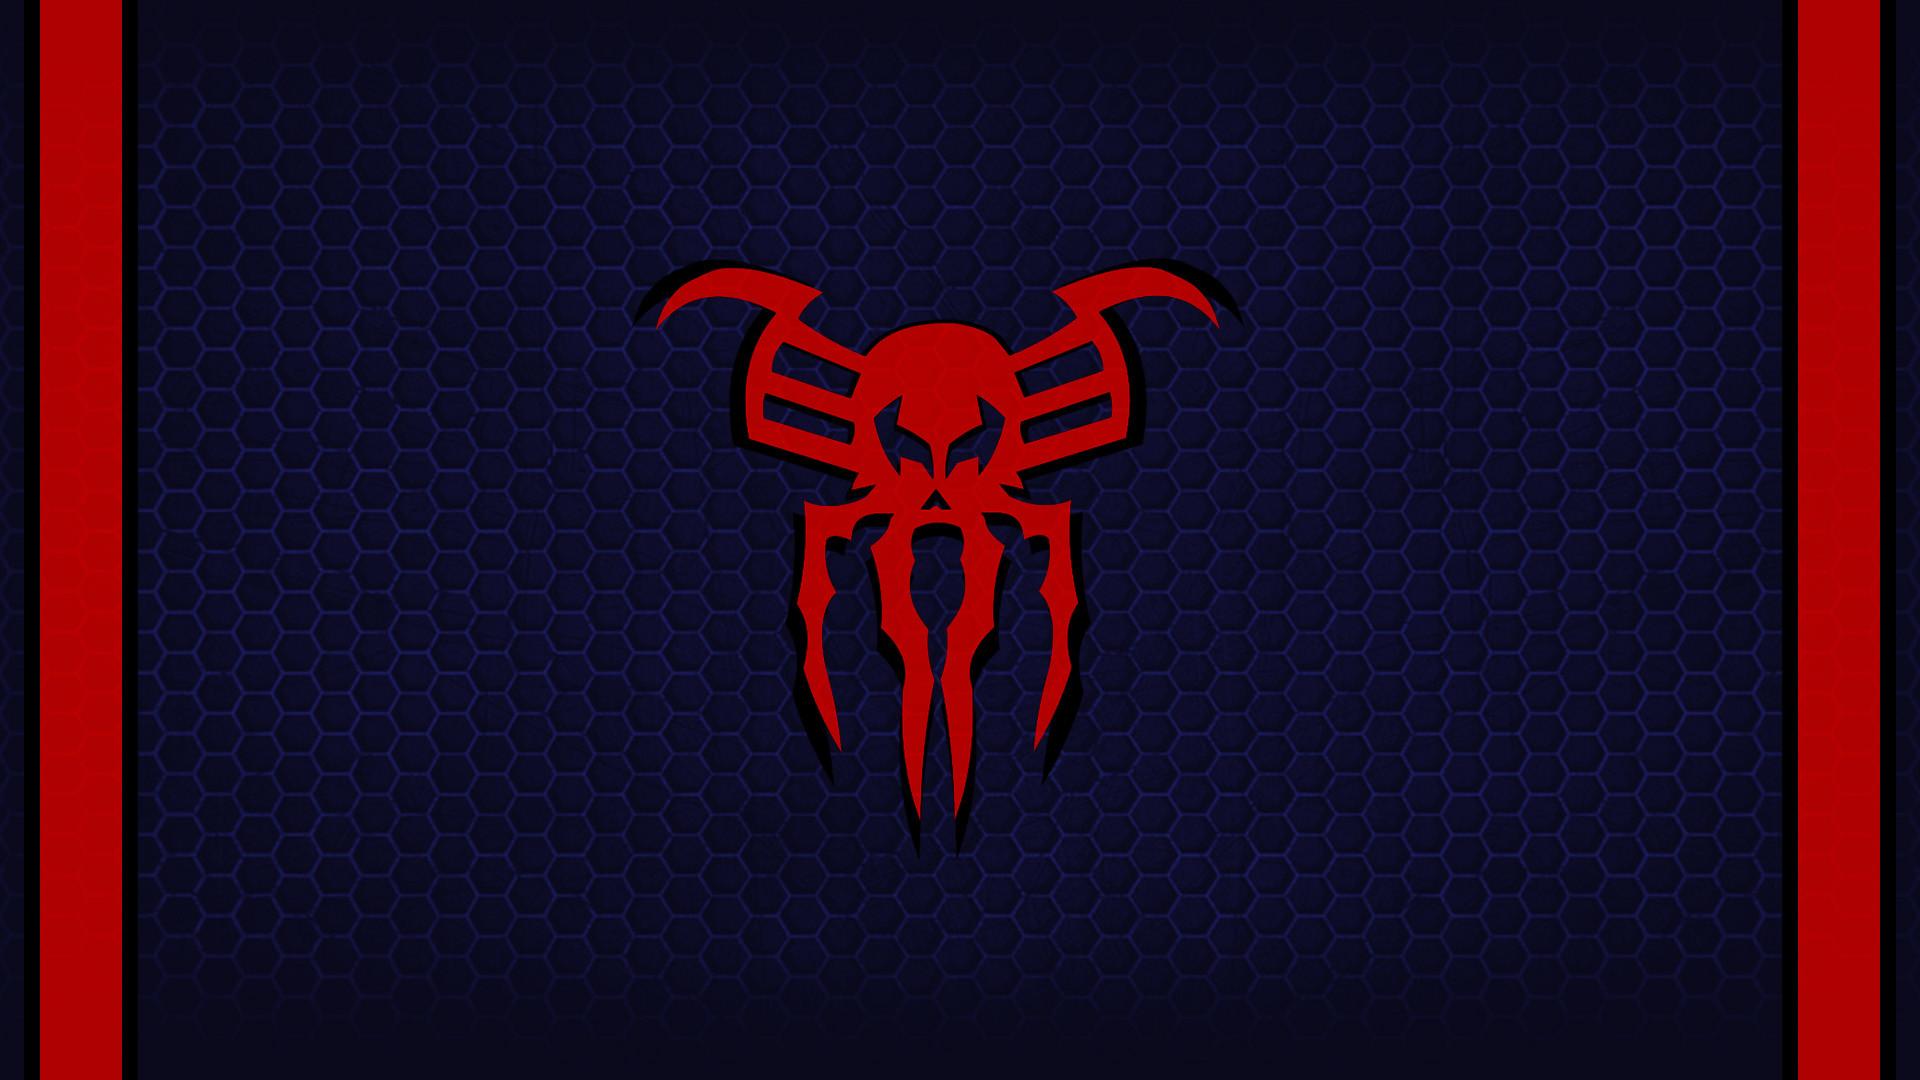 Cool Spiderman 2099 Wallpaper